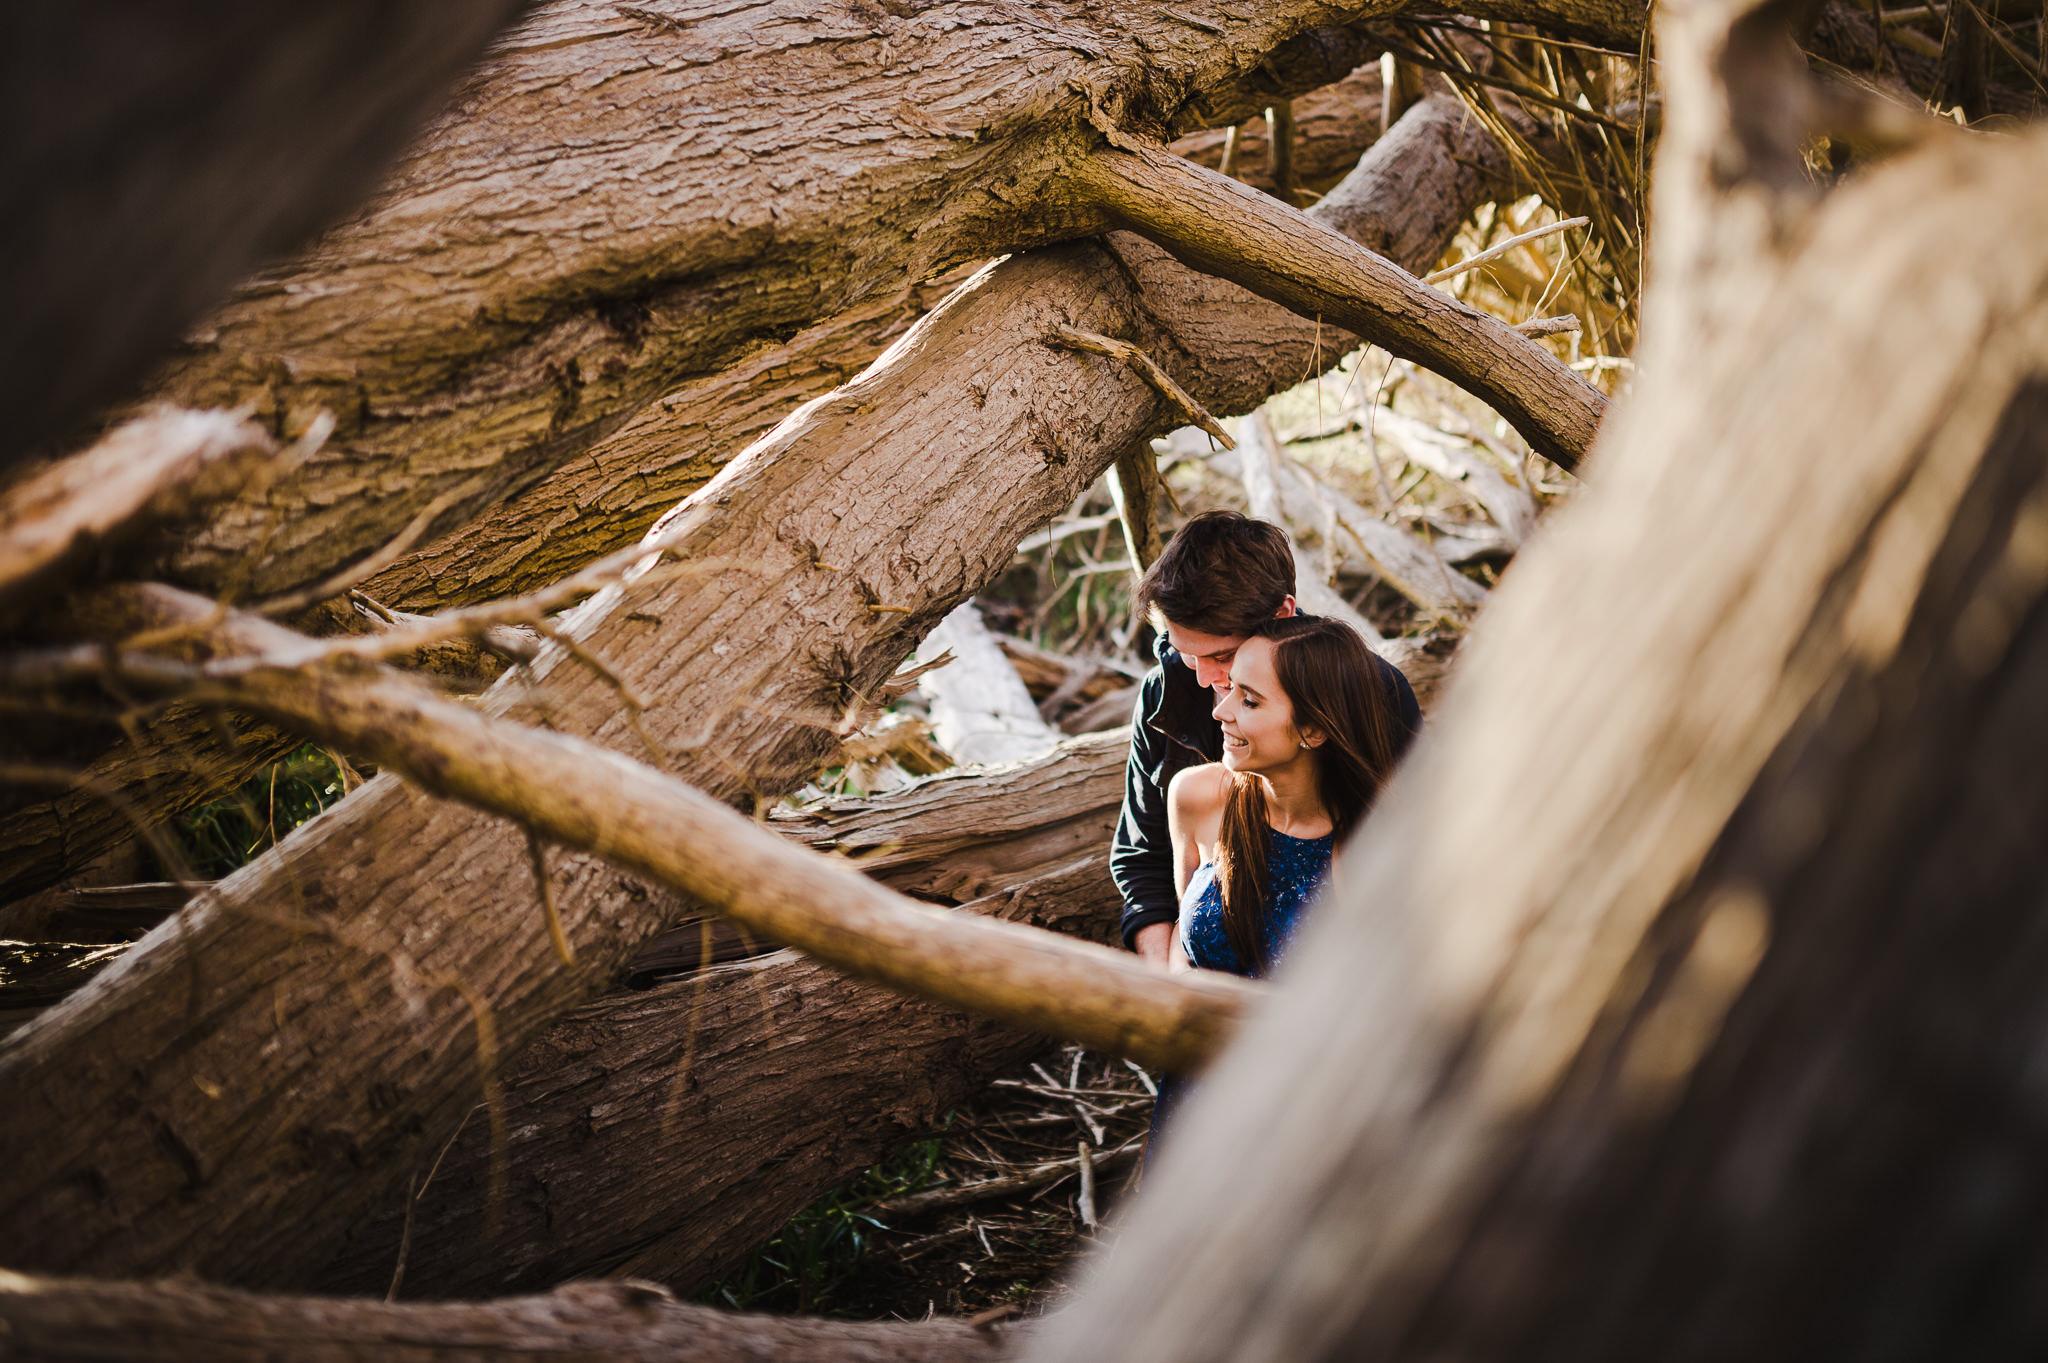 5 couple cuddling in tree fort.JPG